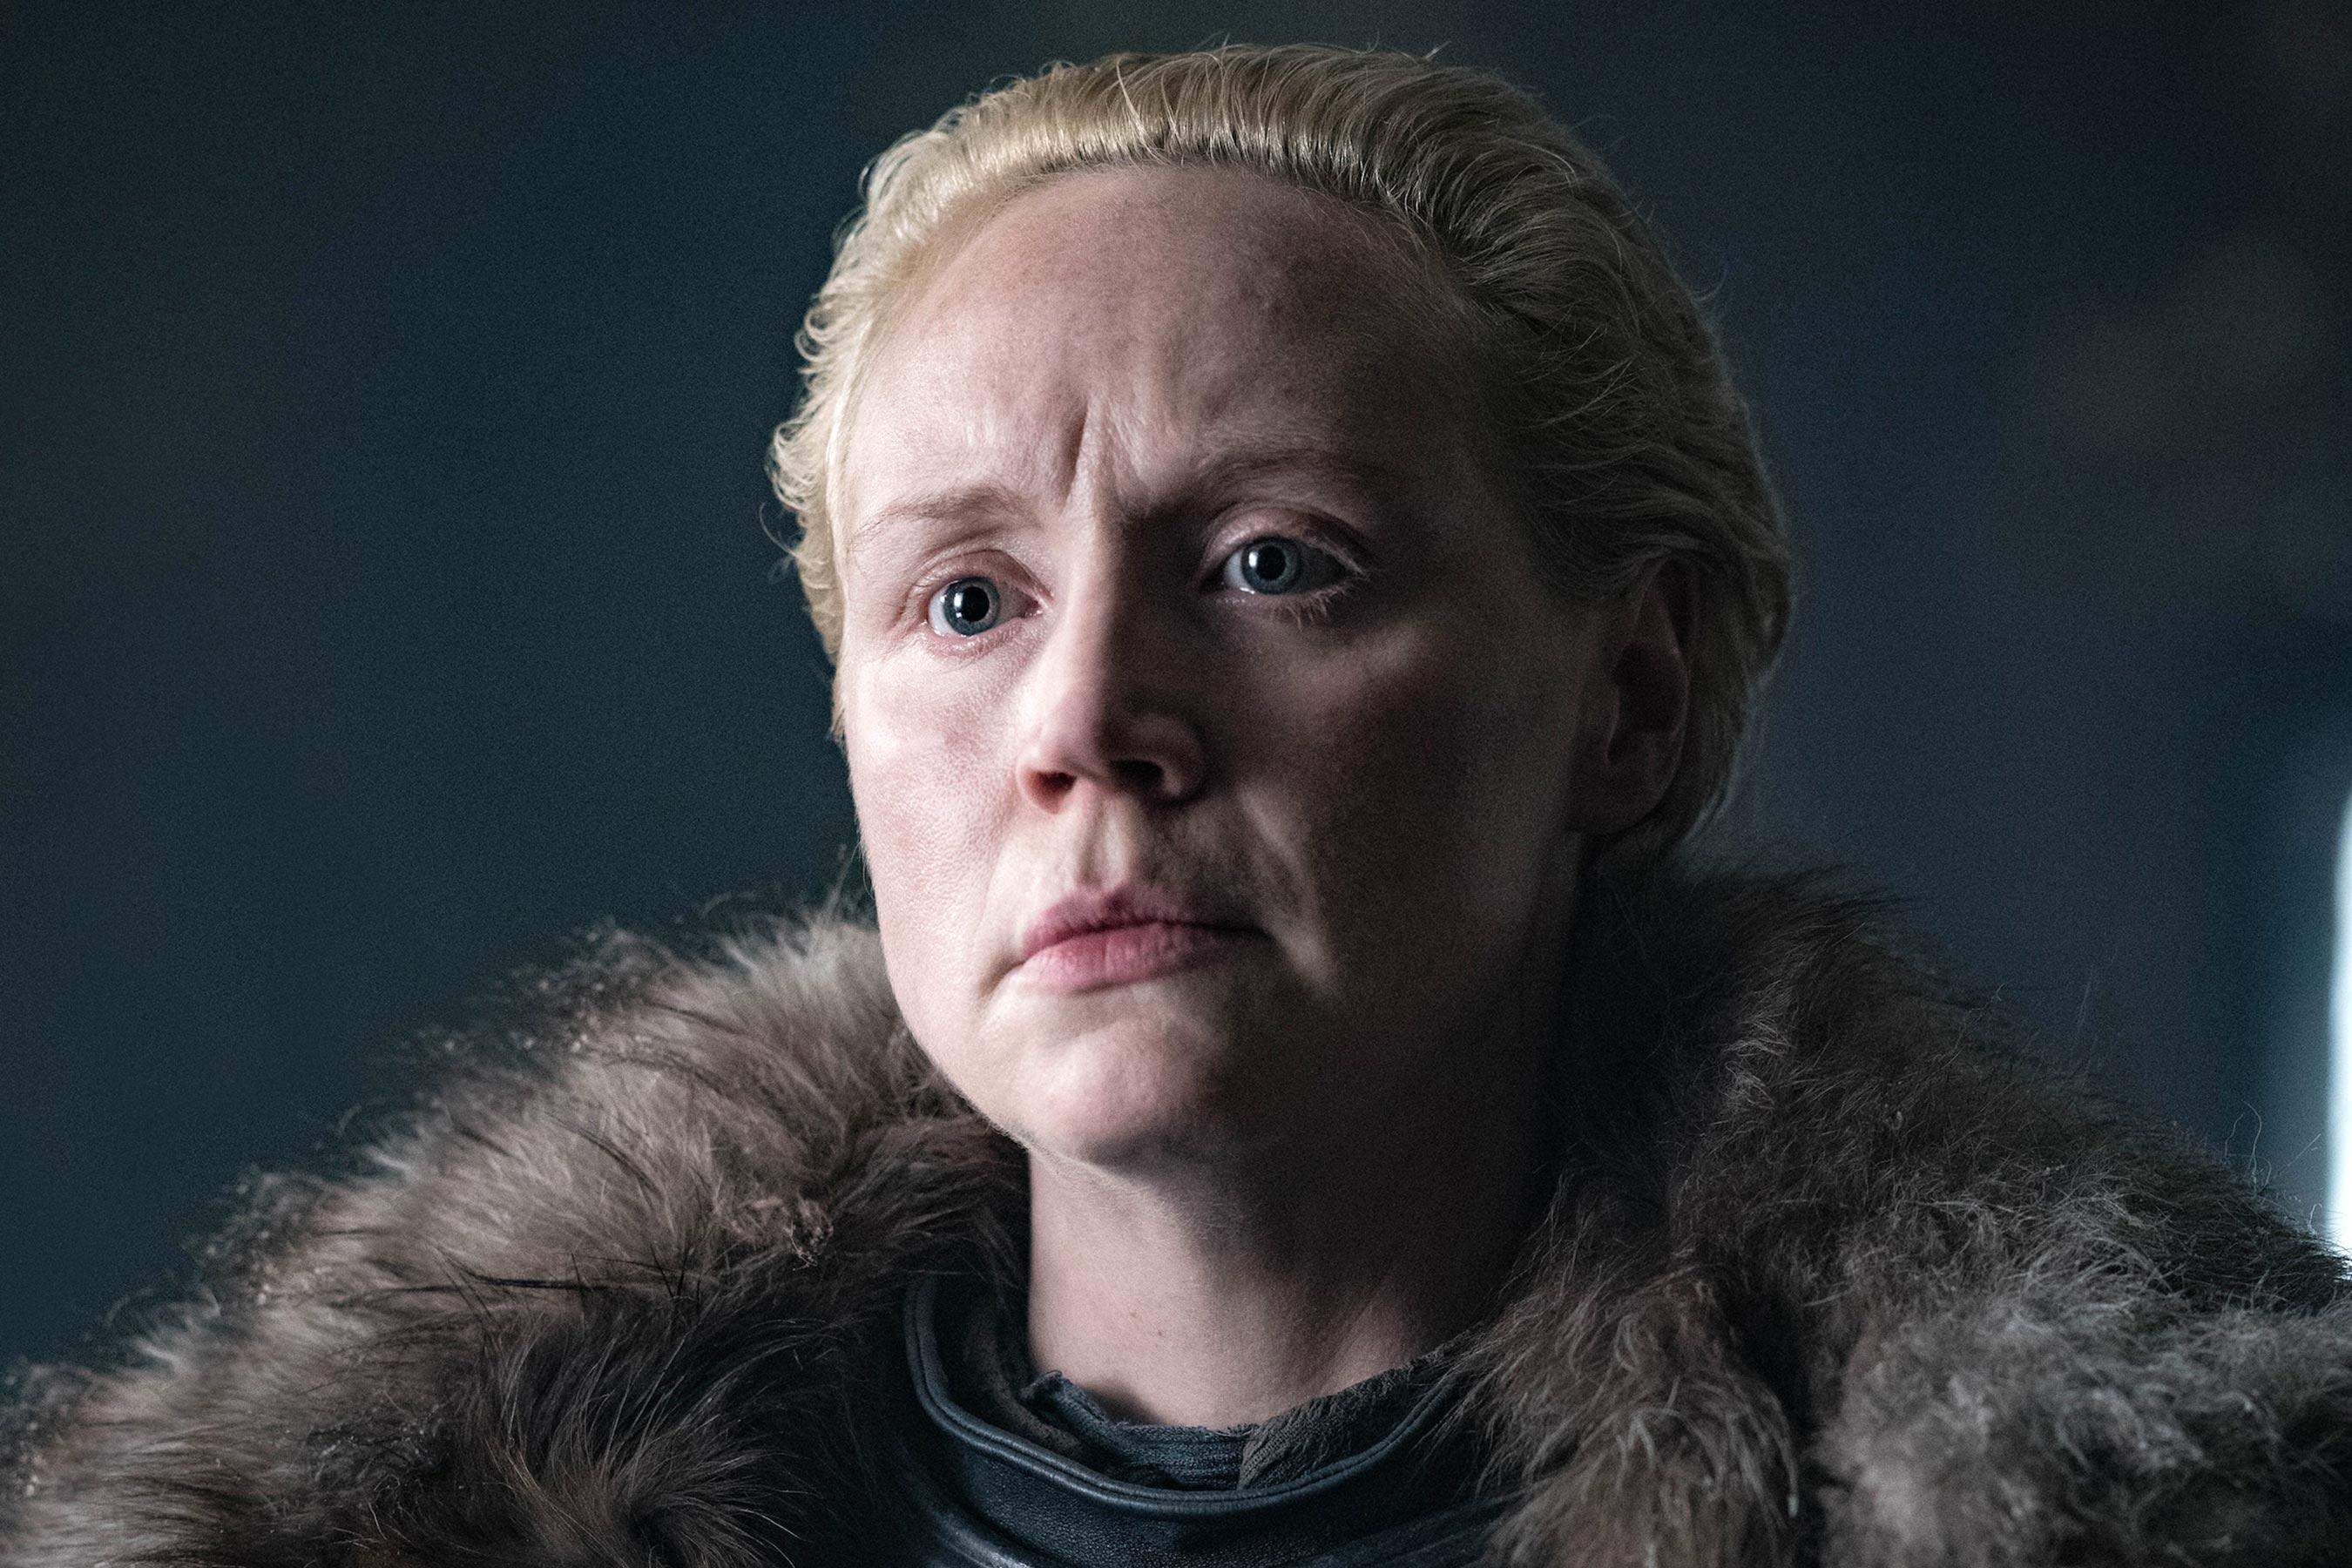 Gra o tron - Brienne